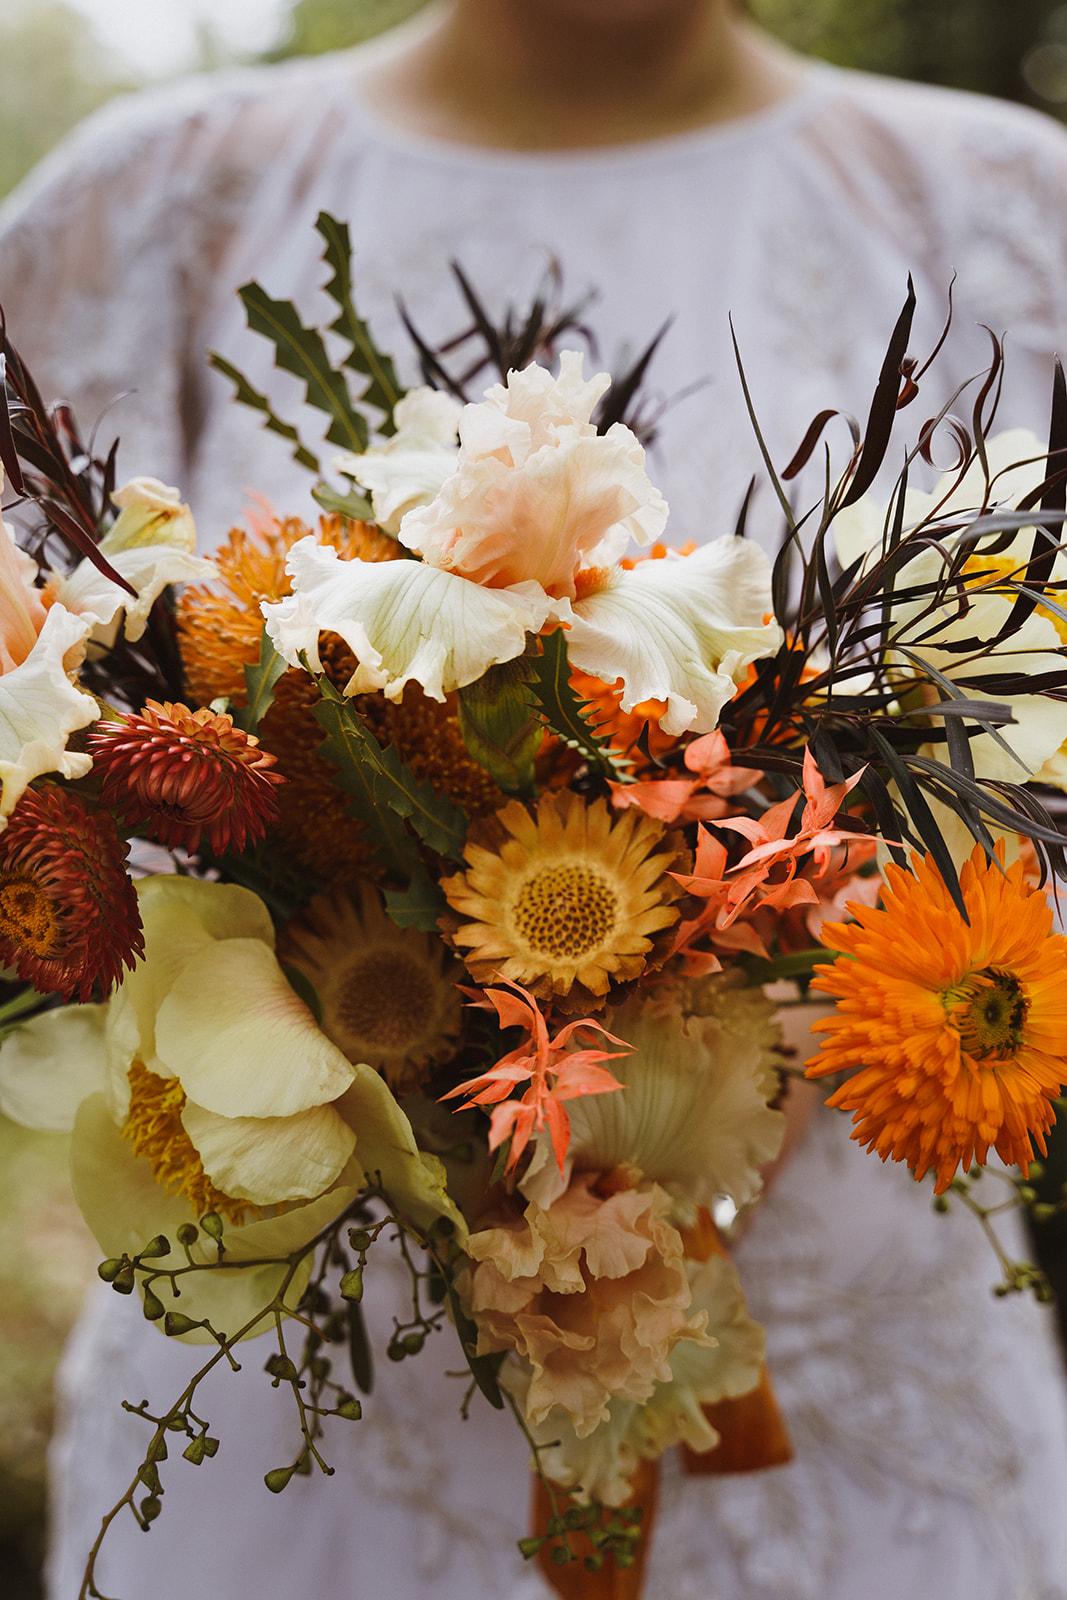 Tuckaway Tree Farm Lebanon Maine Wedding Inspiration 27